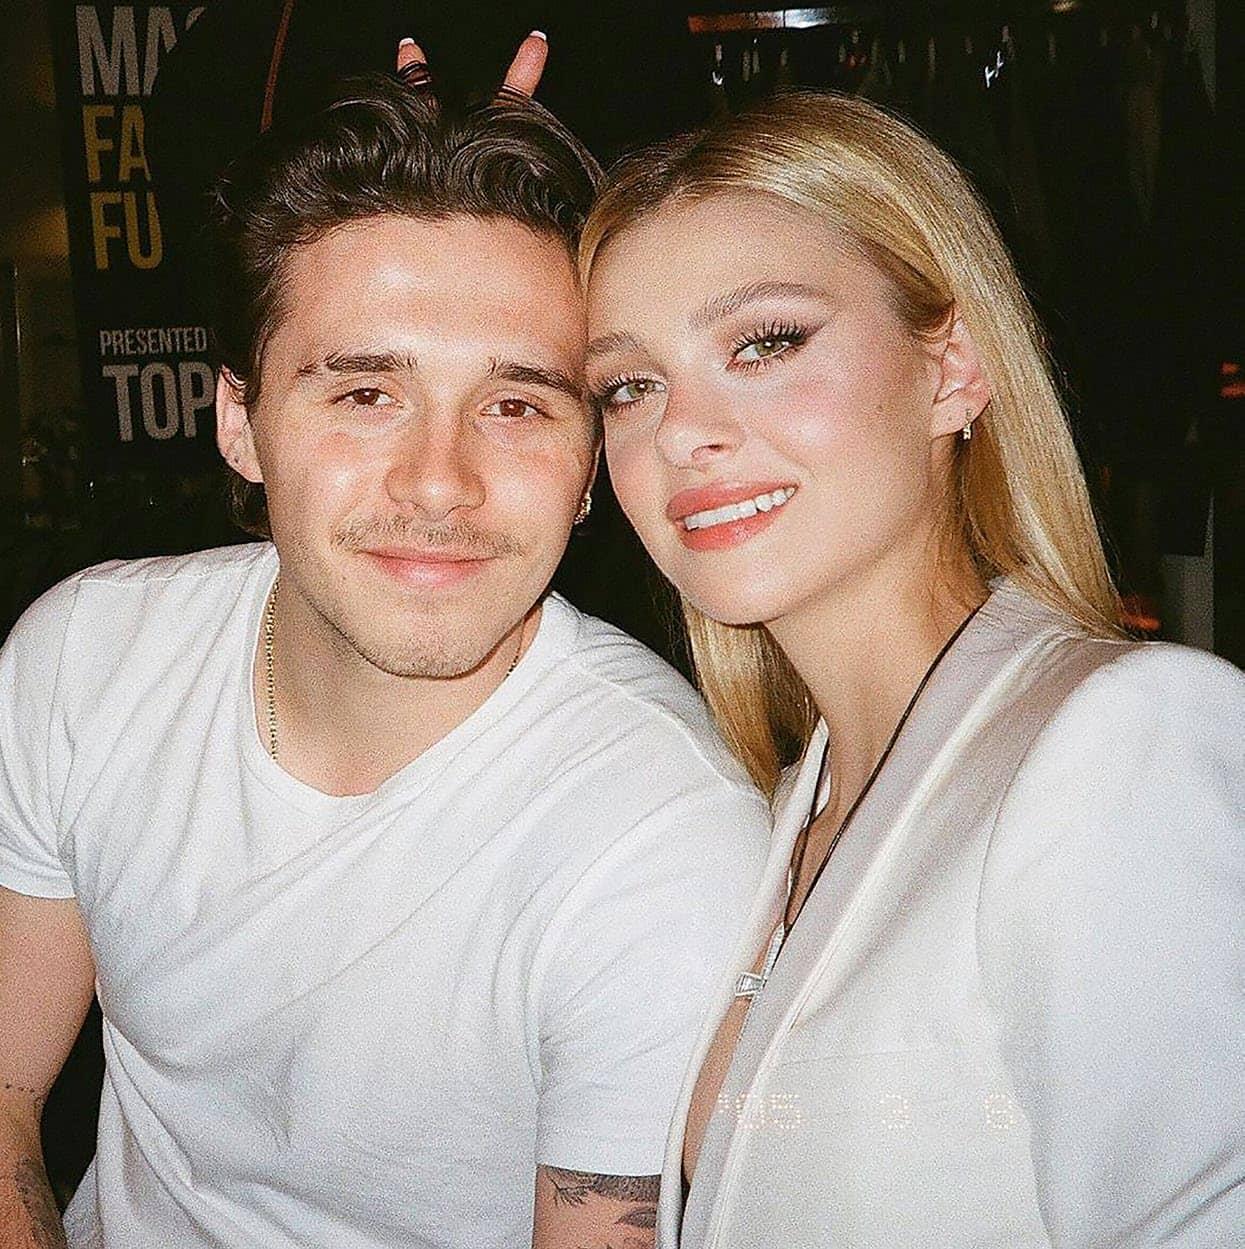 Brooklyn & Nicola Married Already?